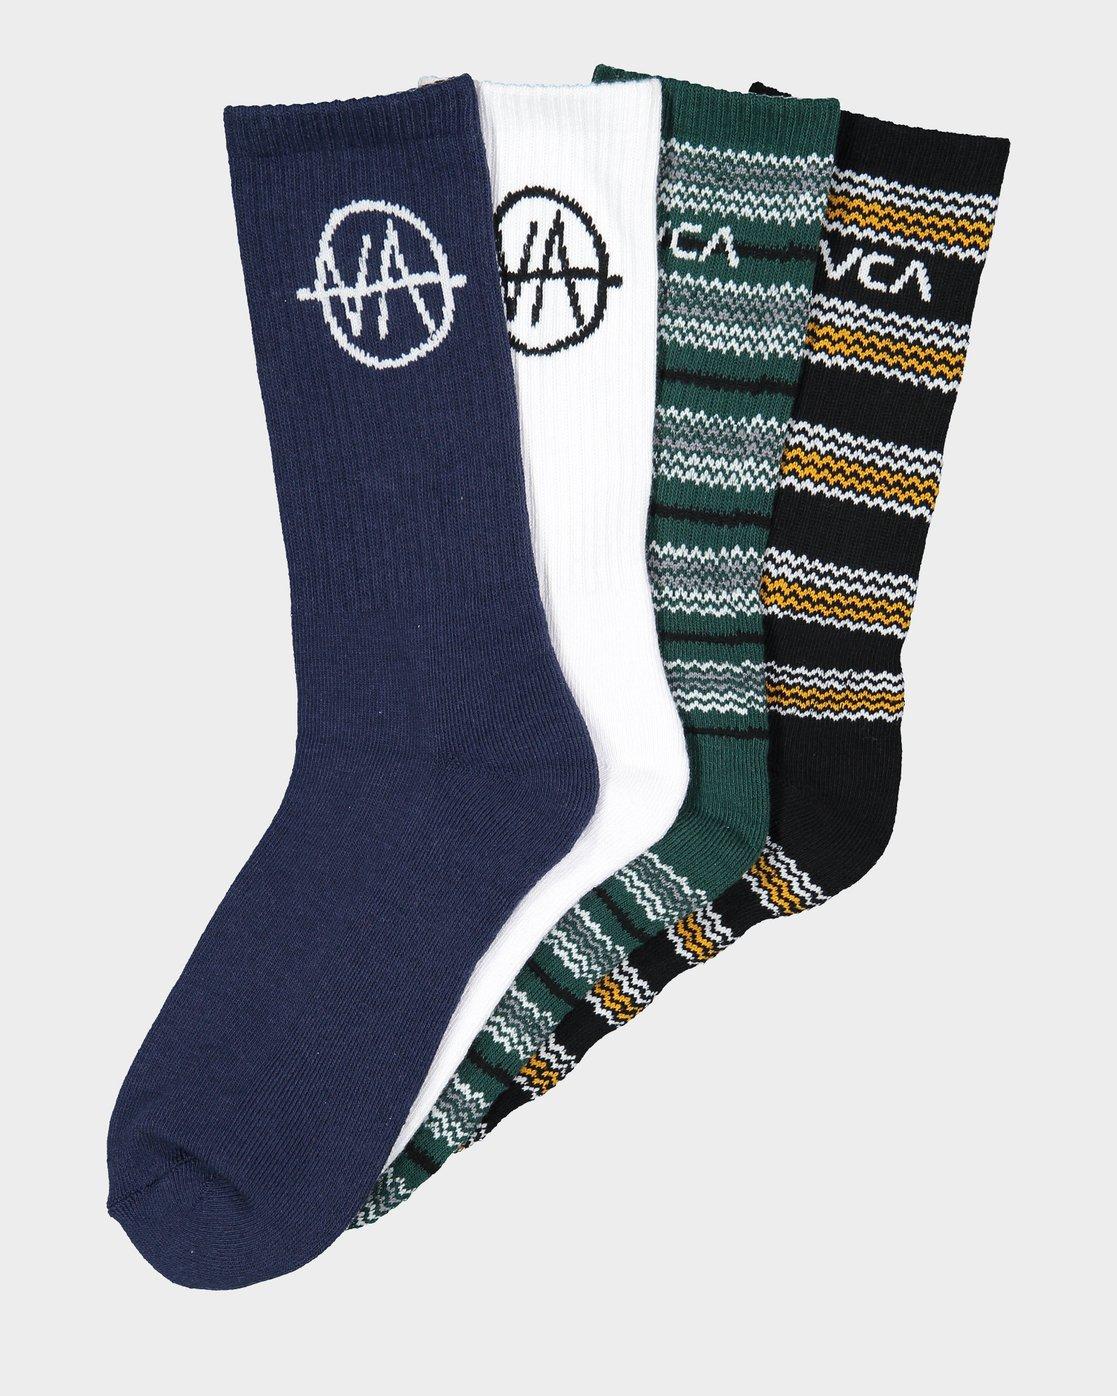 0 RVCA Allsorts Sock 4 Pack  R191603 RVCA